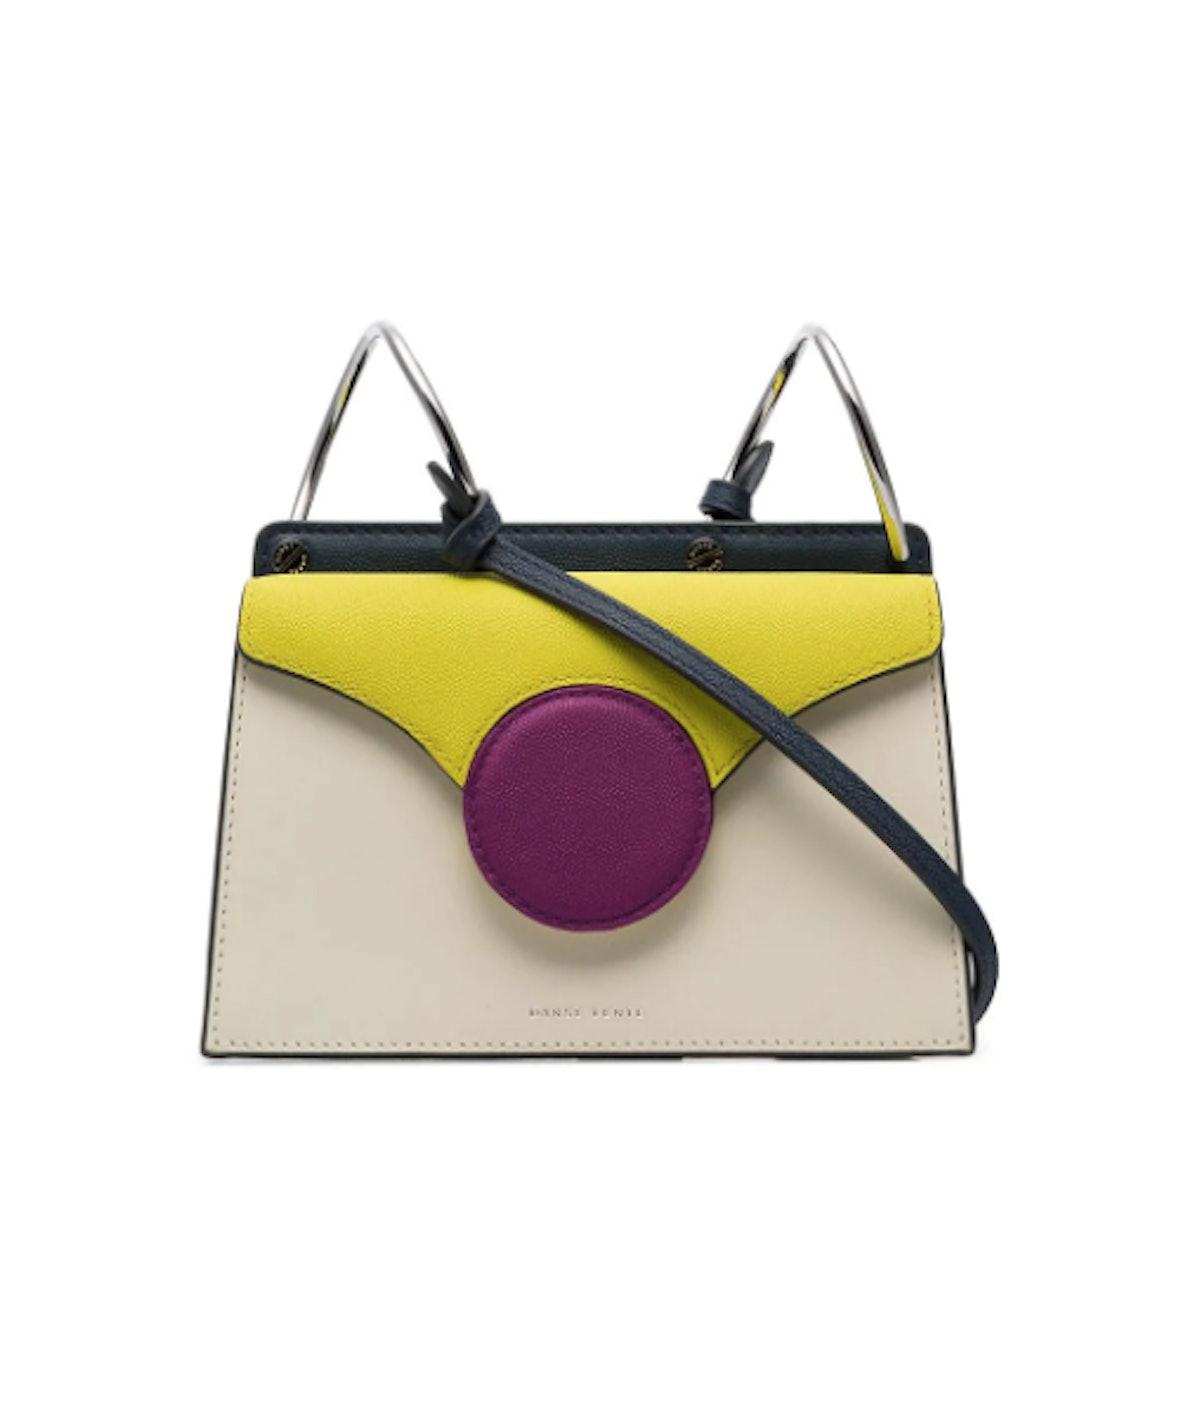 White Phoebe Mini Leather Crossbody Bag